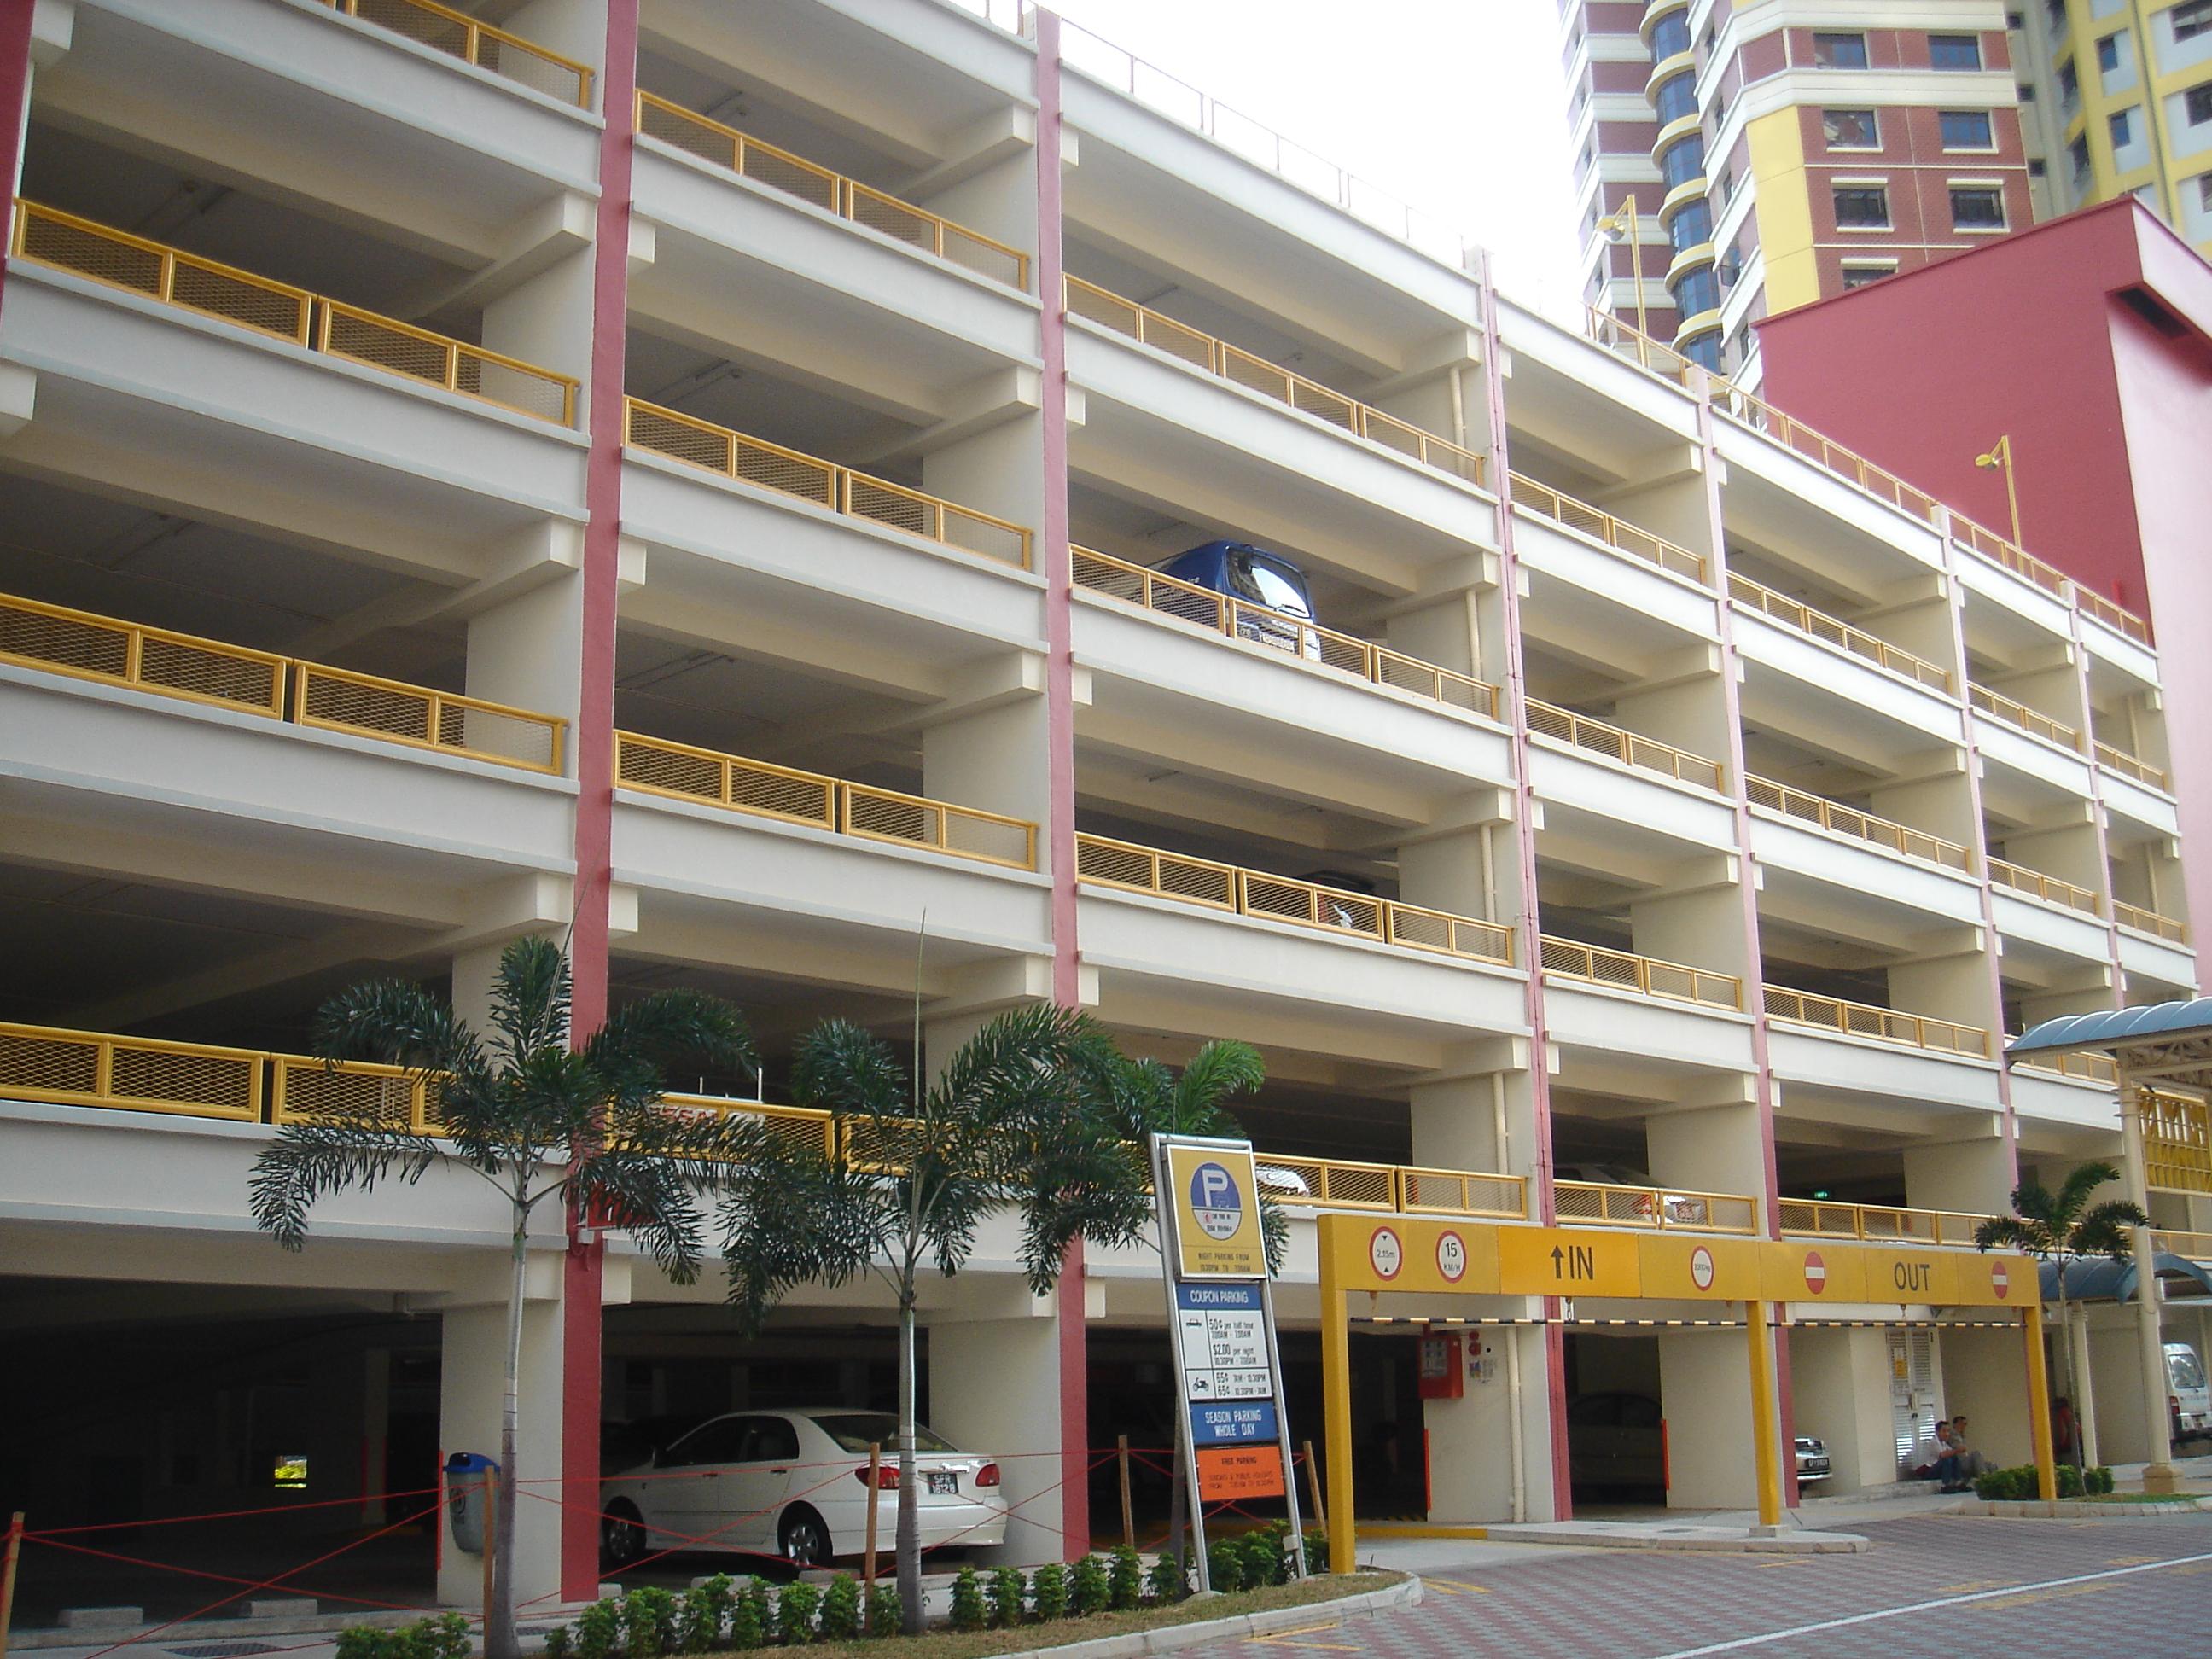 Gedung Parkir Wikiwand